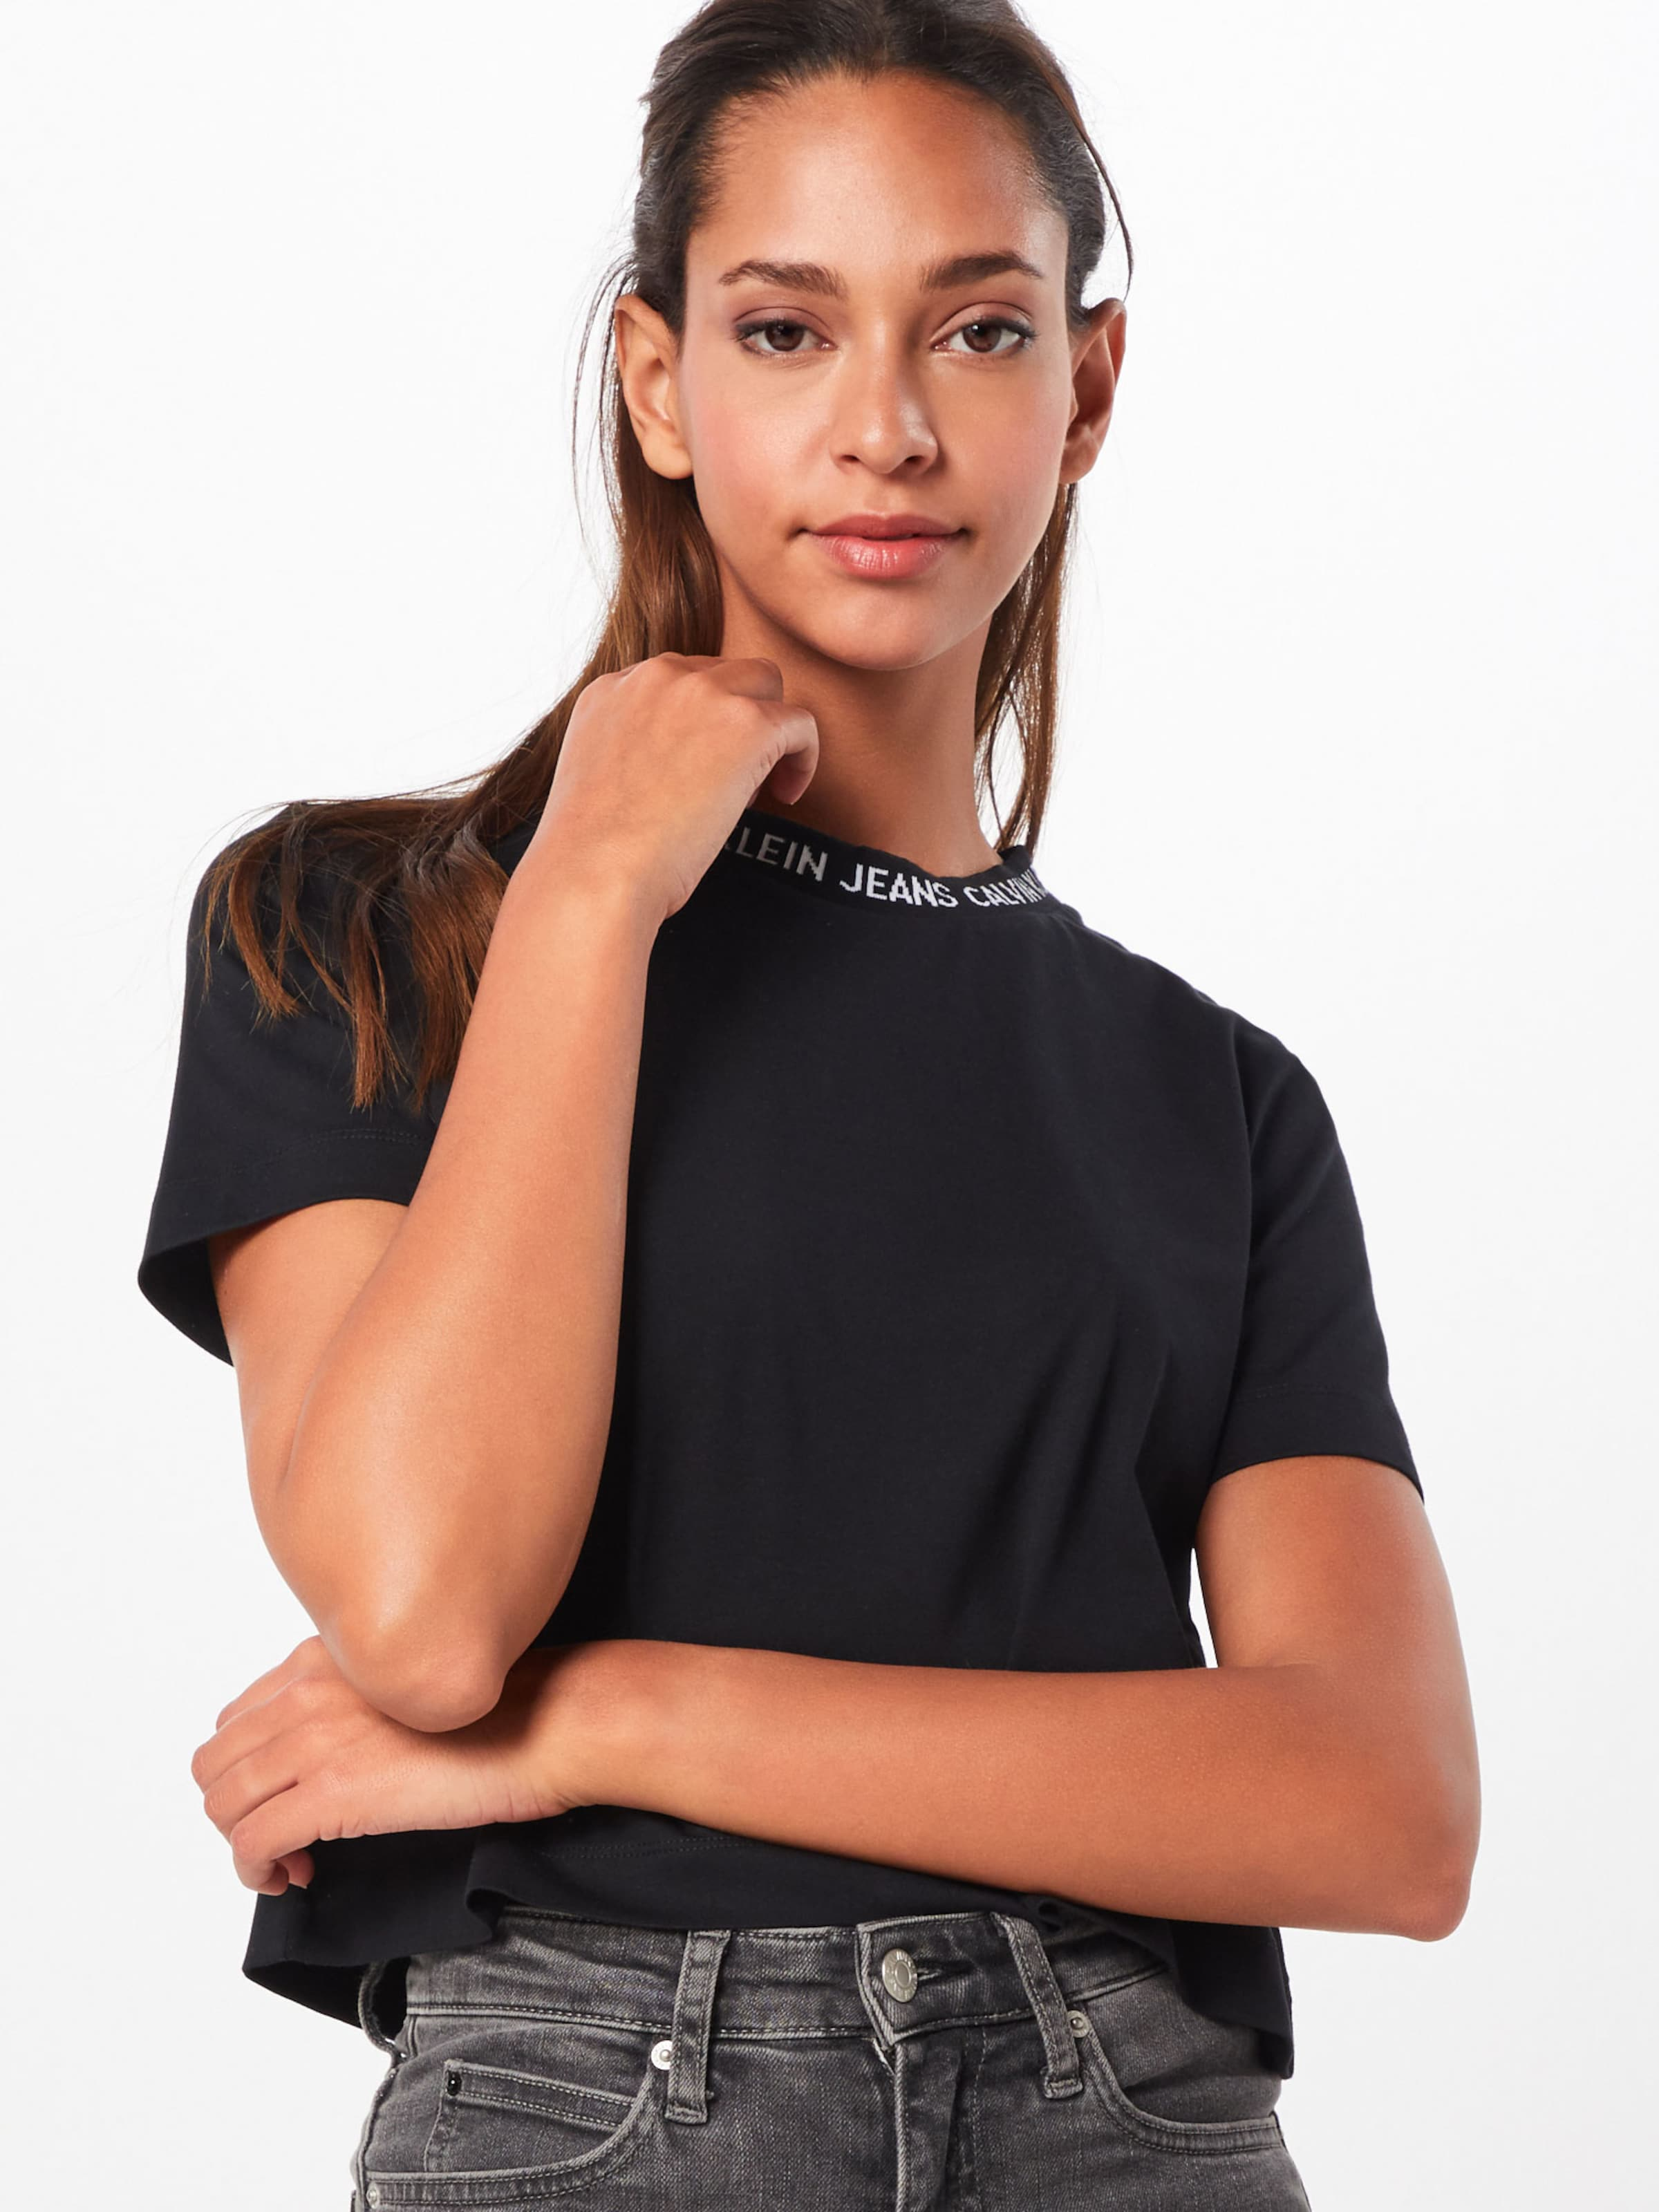 Jeans Schwarz Klein Calvin Shirt In n0OP8kXw